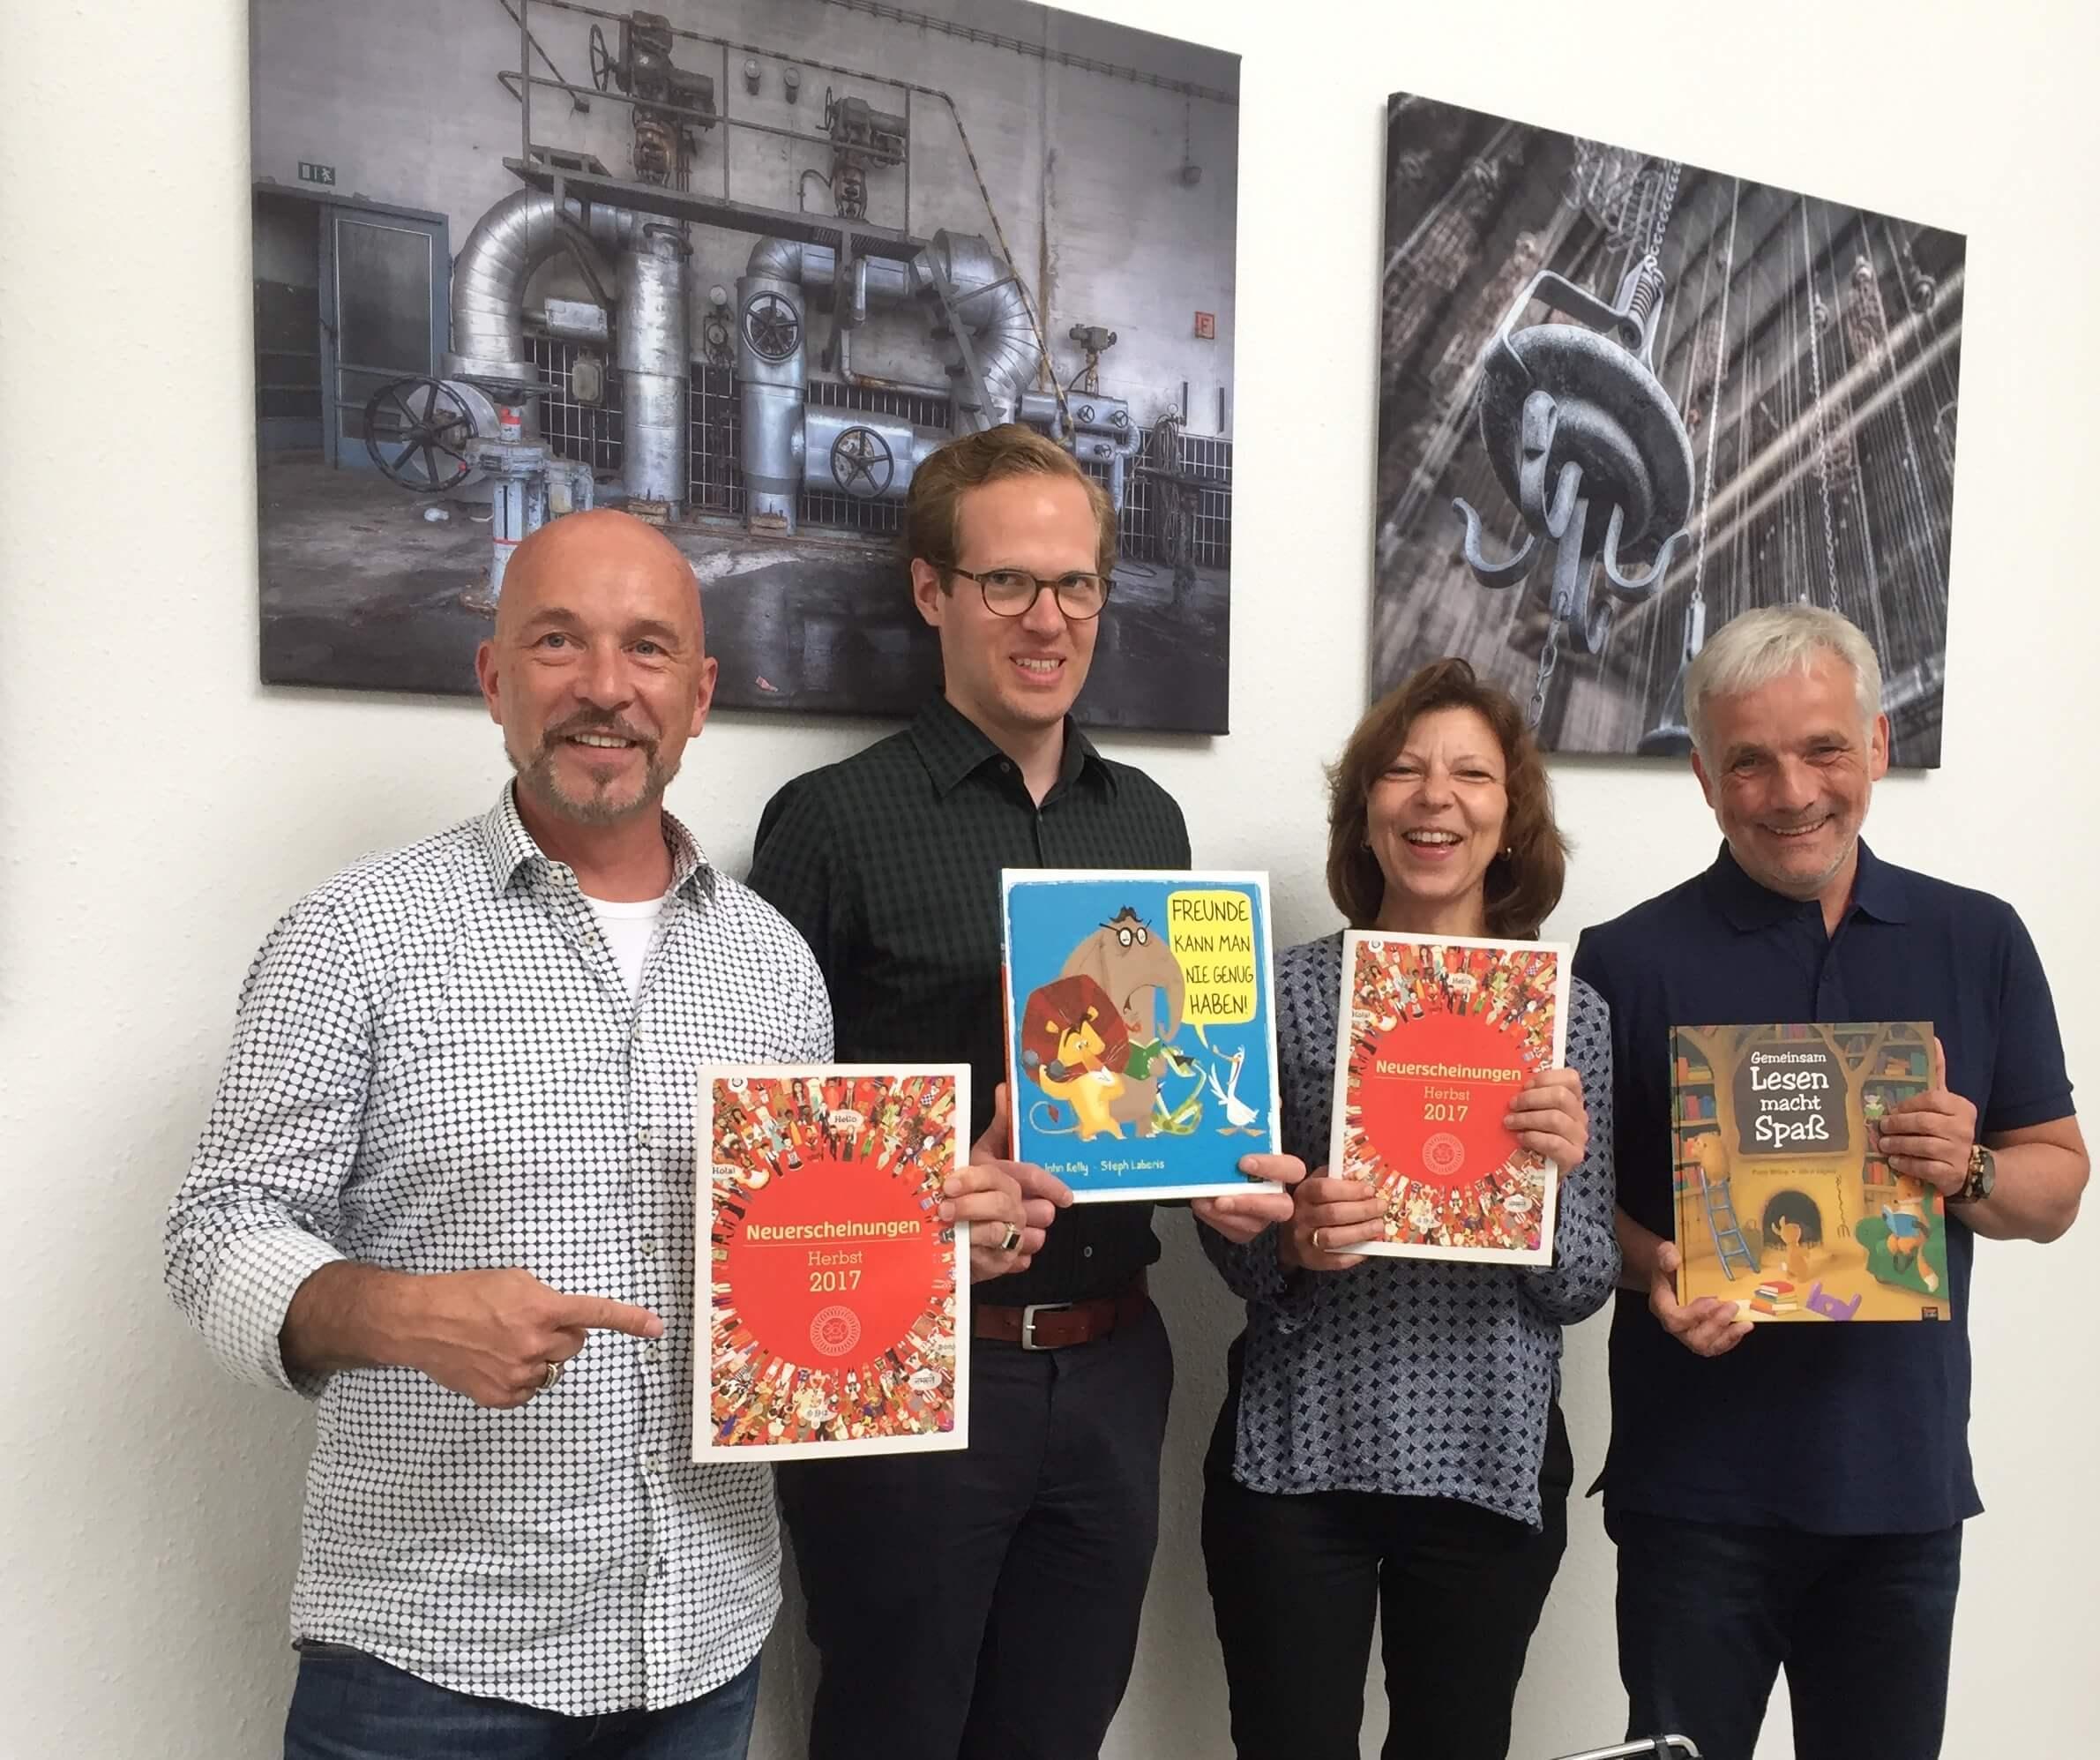 Vertriebsleiter Michael Böhme, Uta Gunasekara und Philipp Schlüter mit Harald Kiesel (v.r.) (c) 360 Grad Verlag